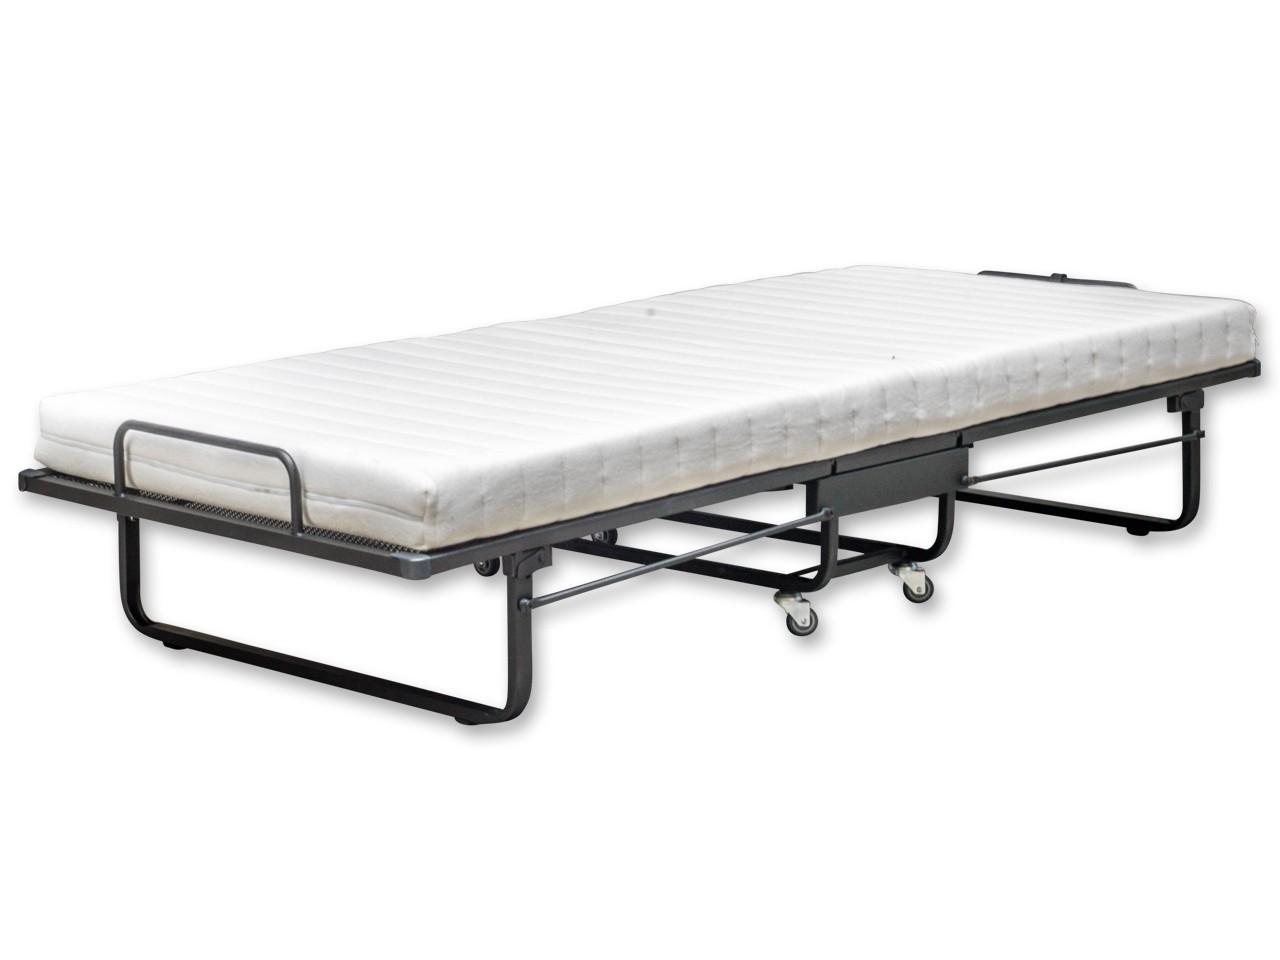 Bed Box Gästebett GB 120 90x200